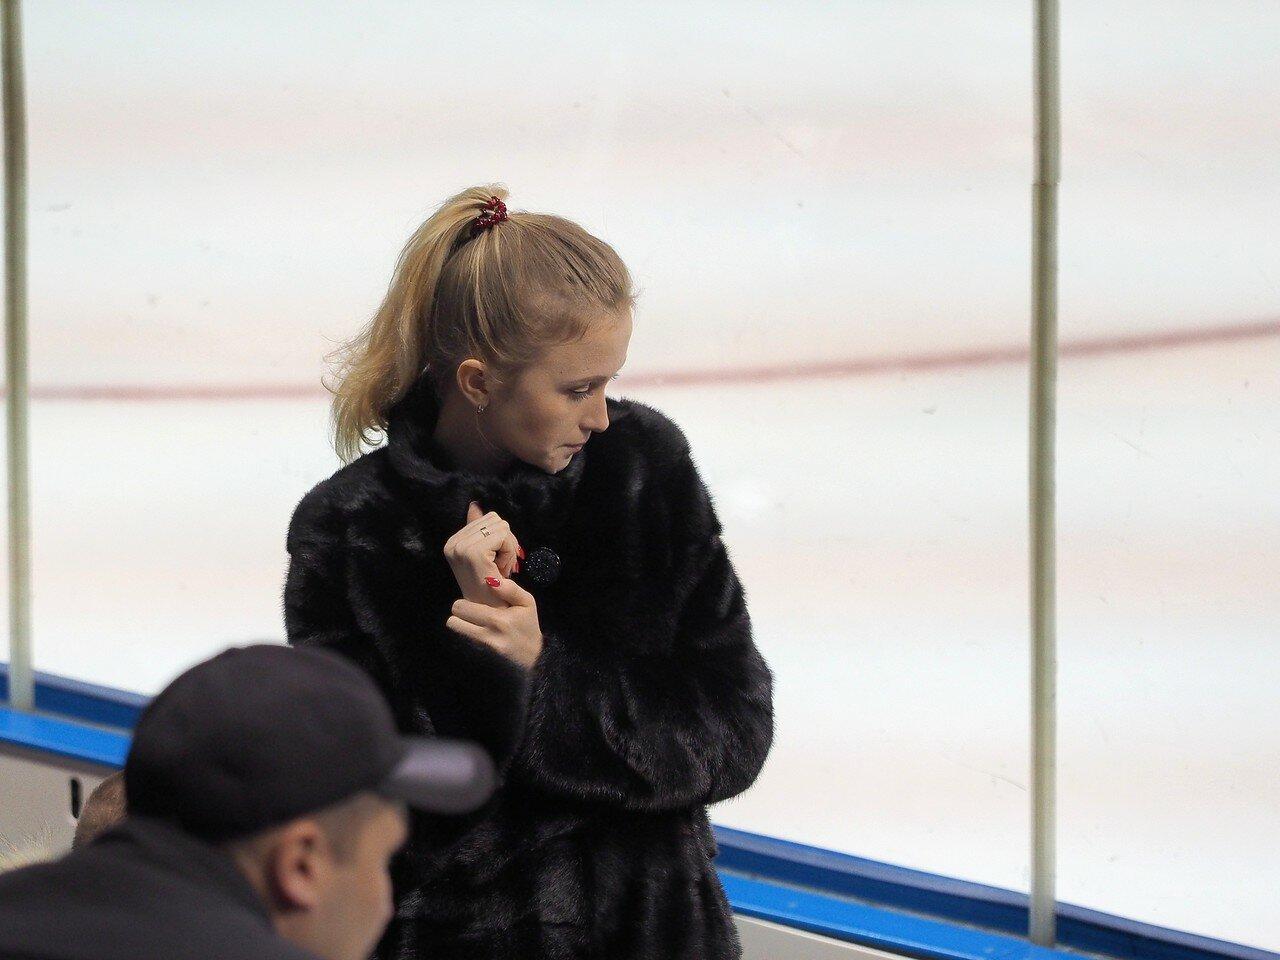 135Плей-офф 2016 Восток Финал Металлург - Салават Юлаев 23.03.2016